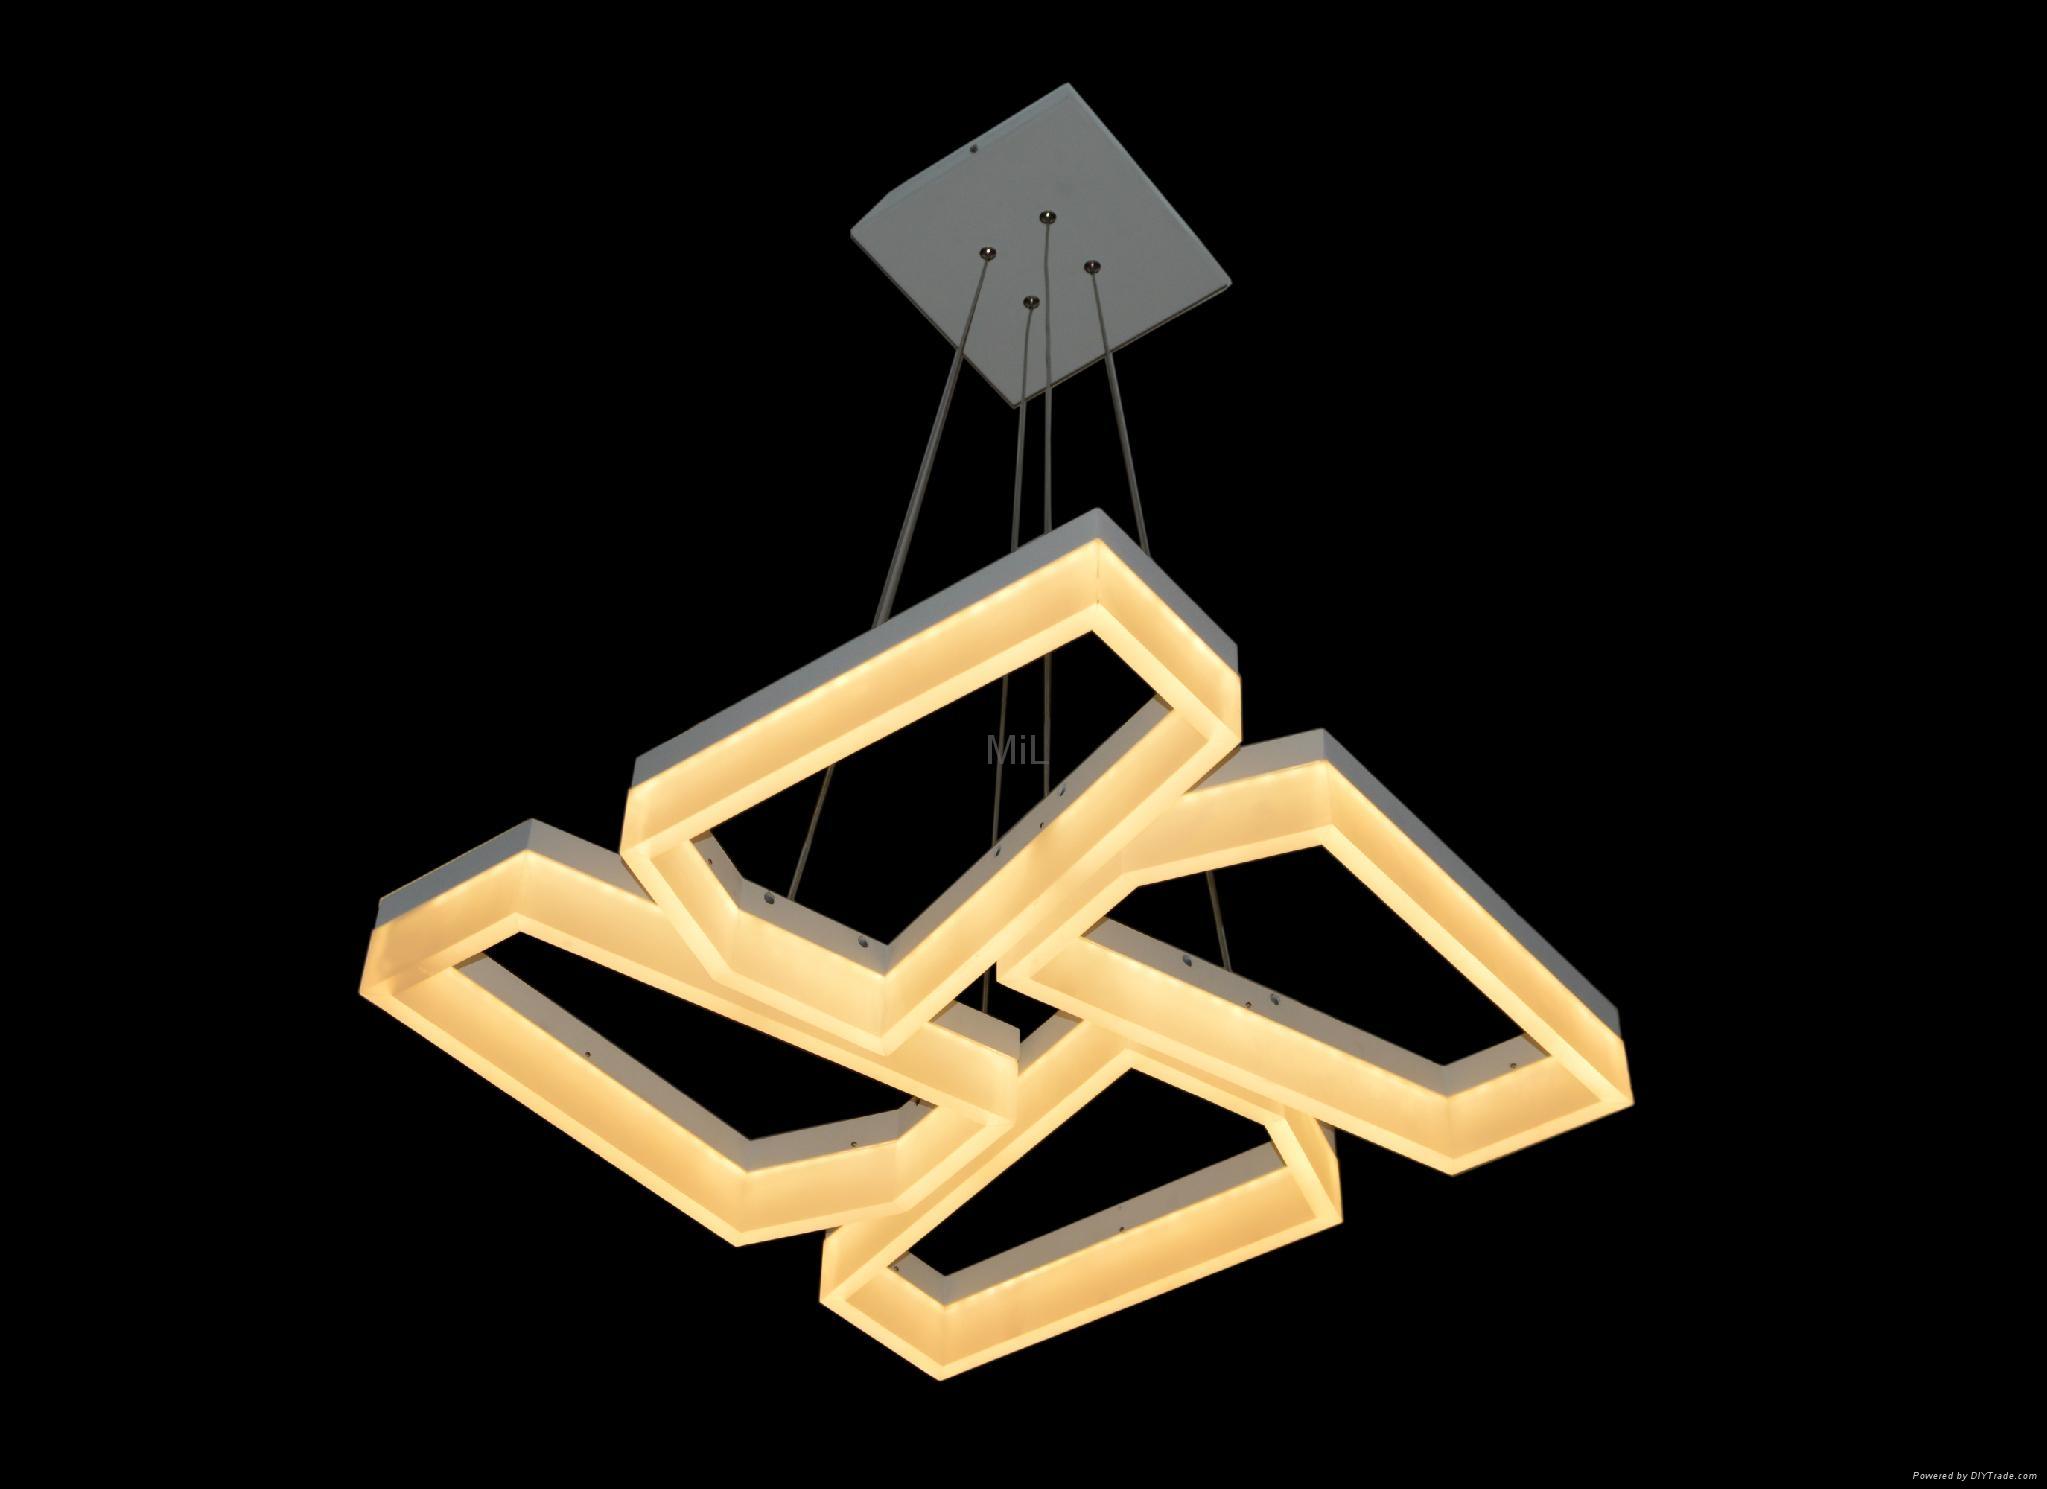 2015 new design hotel led pendant lamp modern smd for Design hotel book 2015